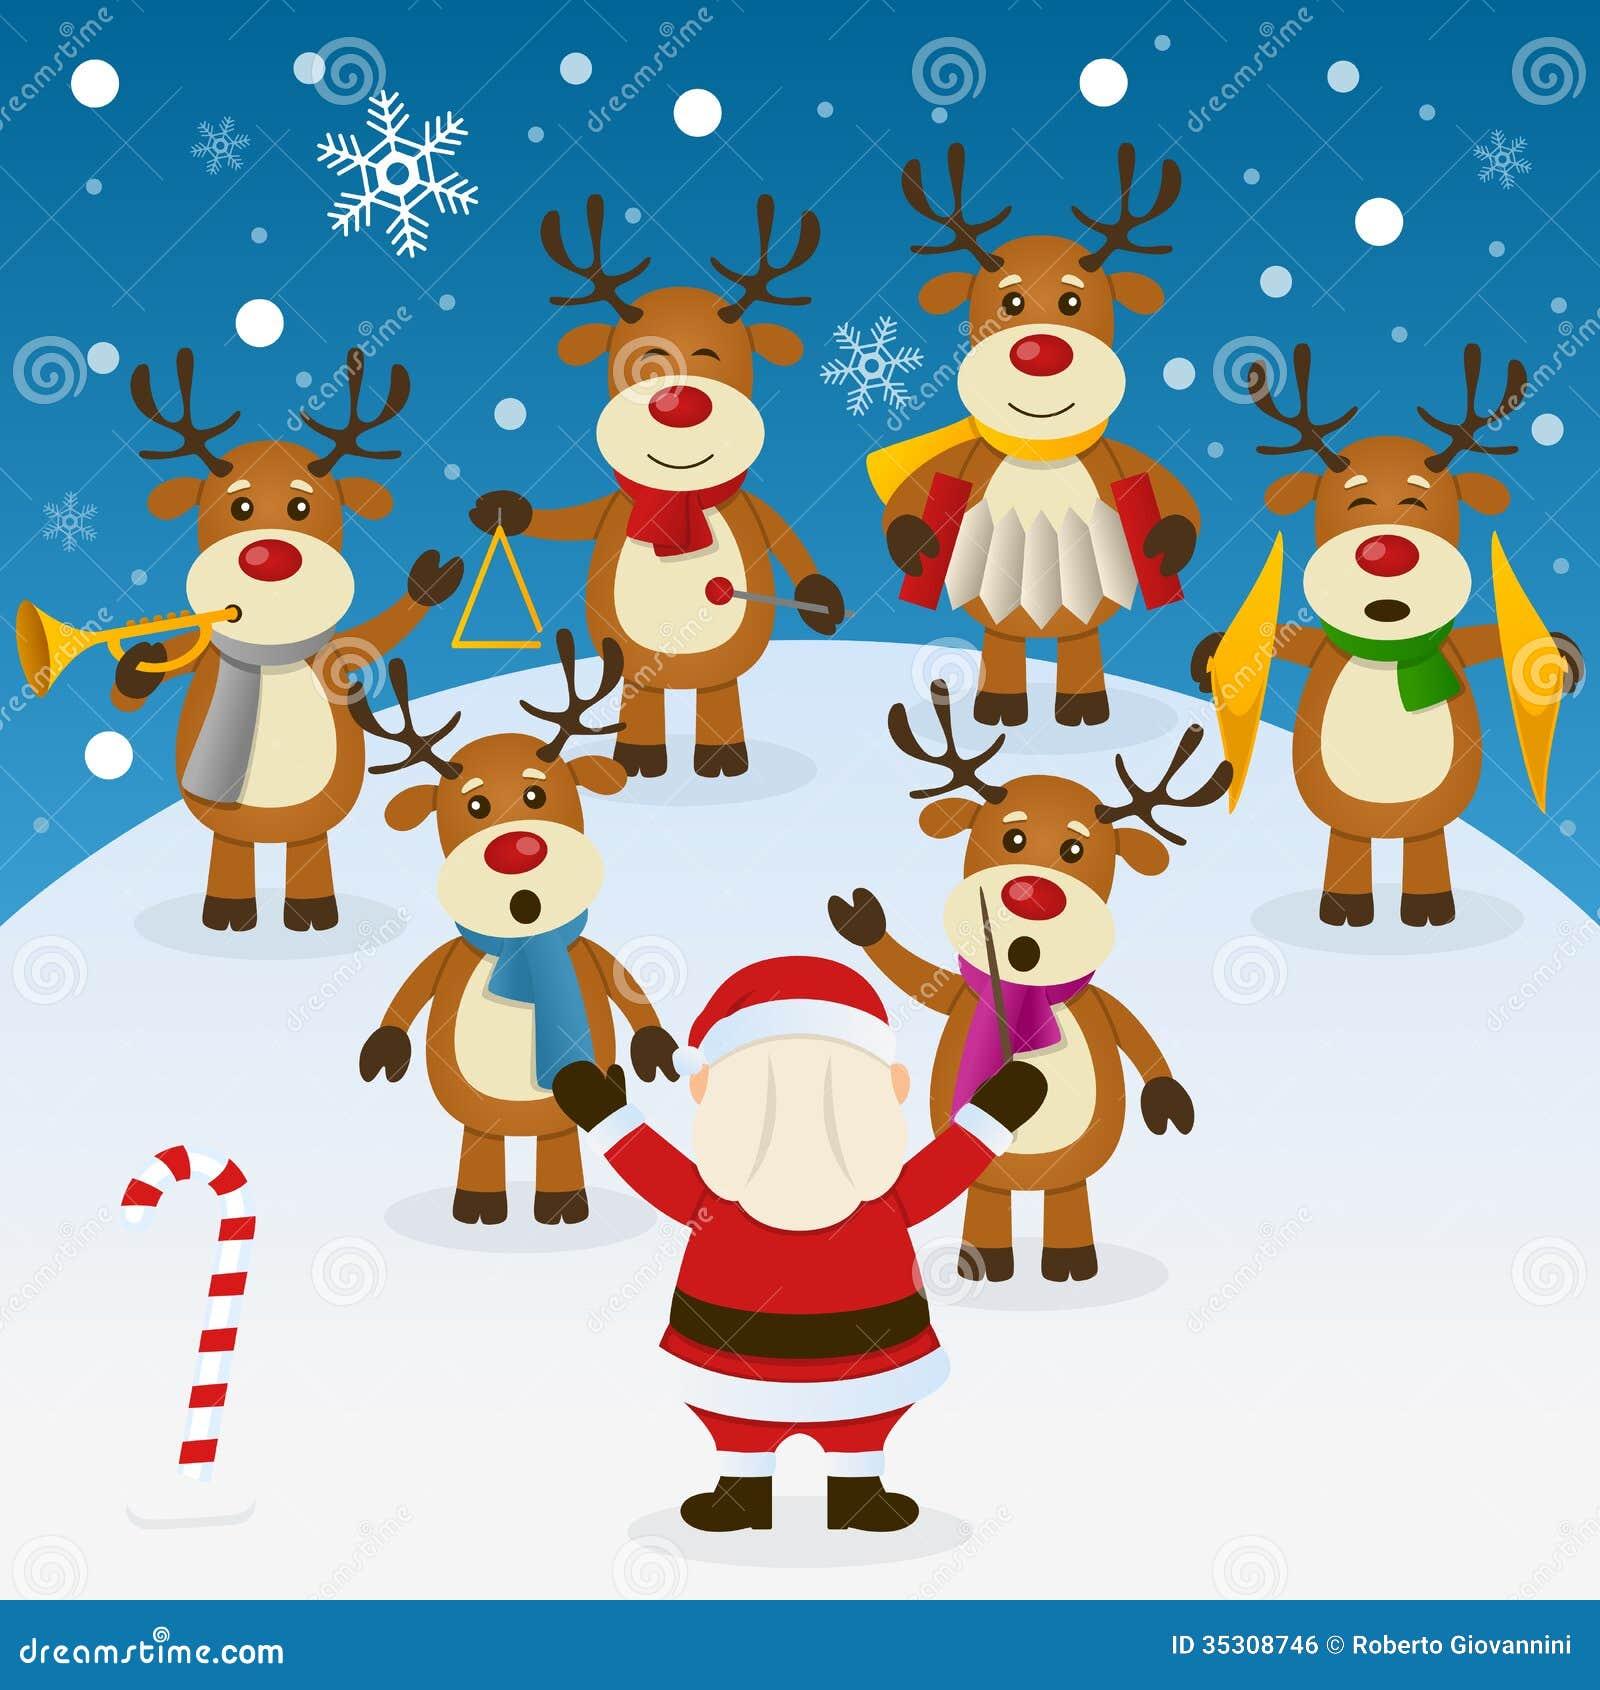 Bells Are Ringing Lyrics Christmas Song